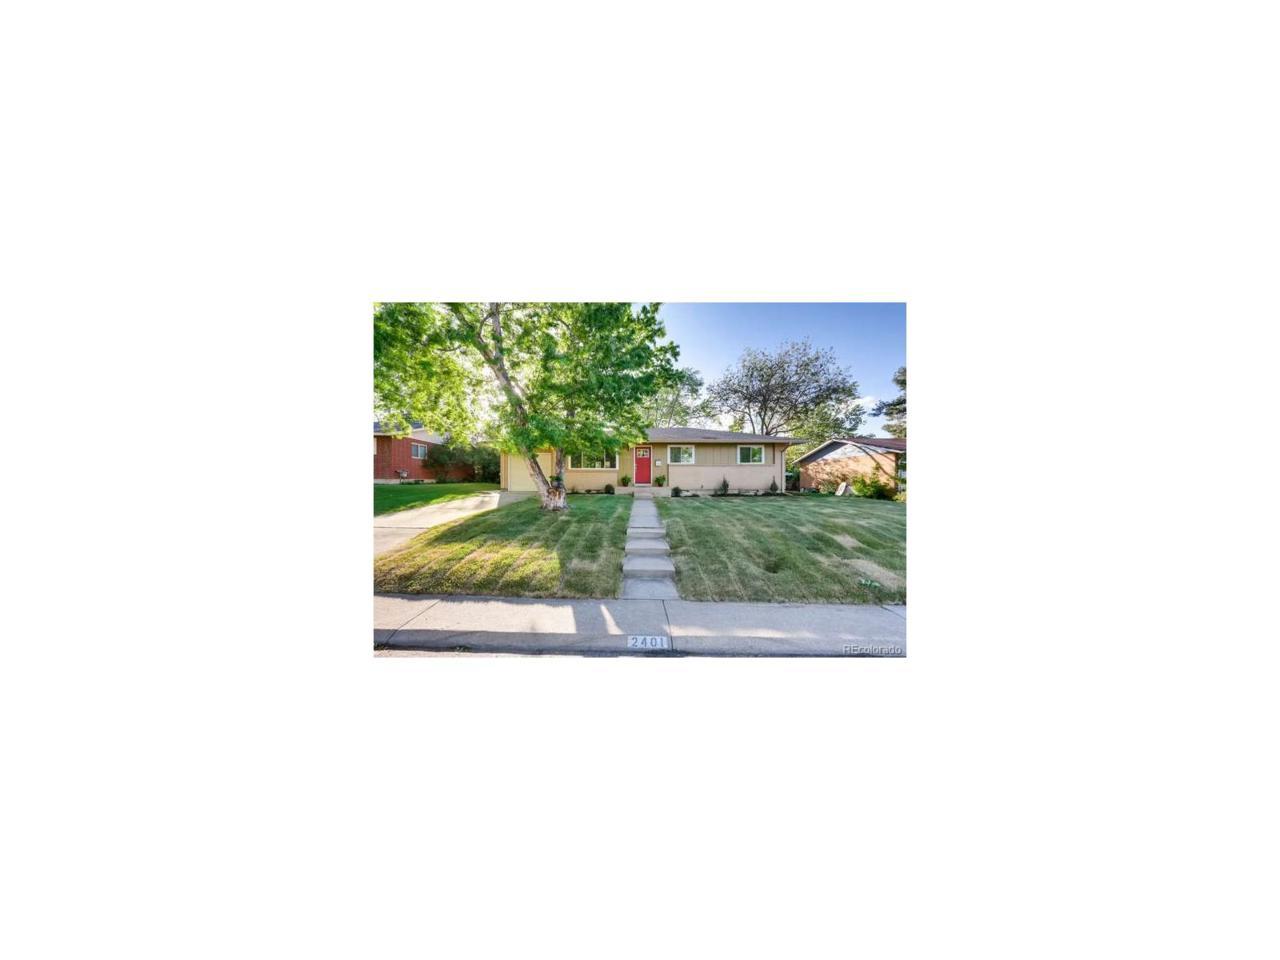 2401 Braun Drive, Golden, CO 80401 (MLS #5637508) :: 8z Real Estate